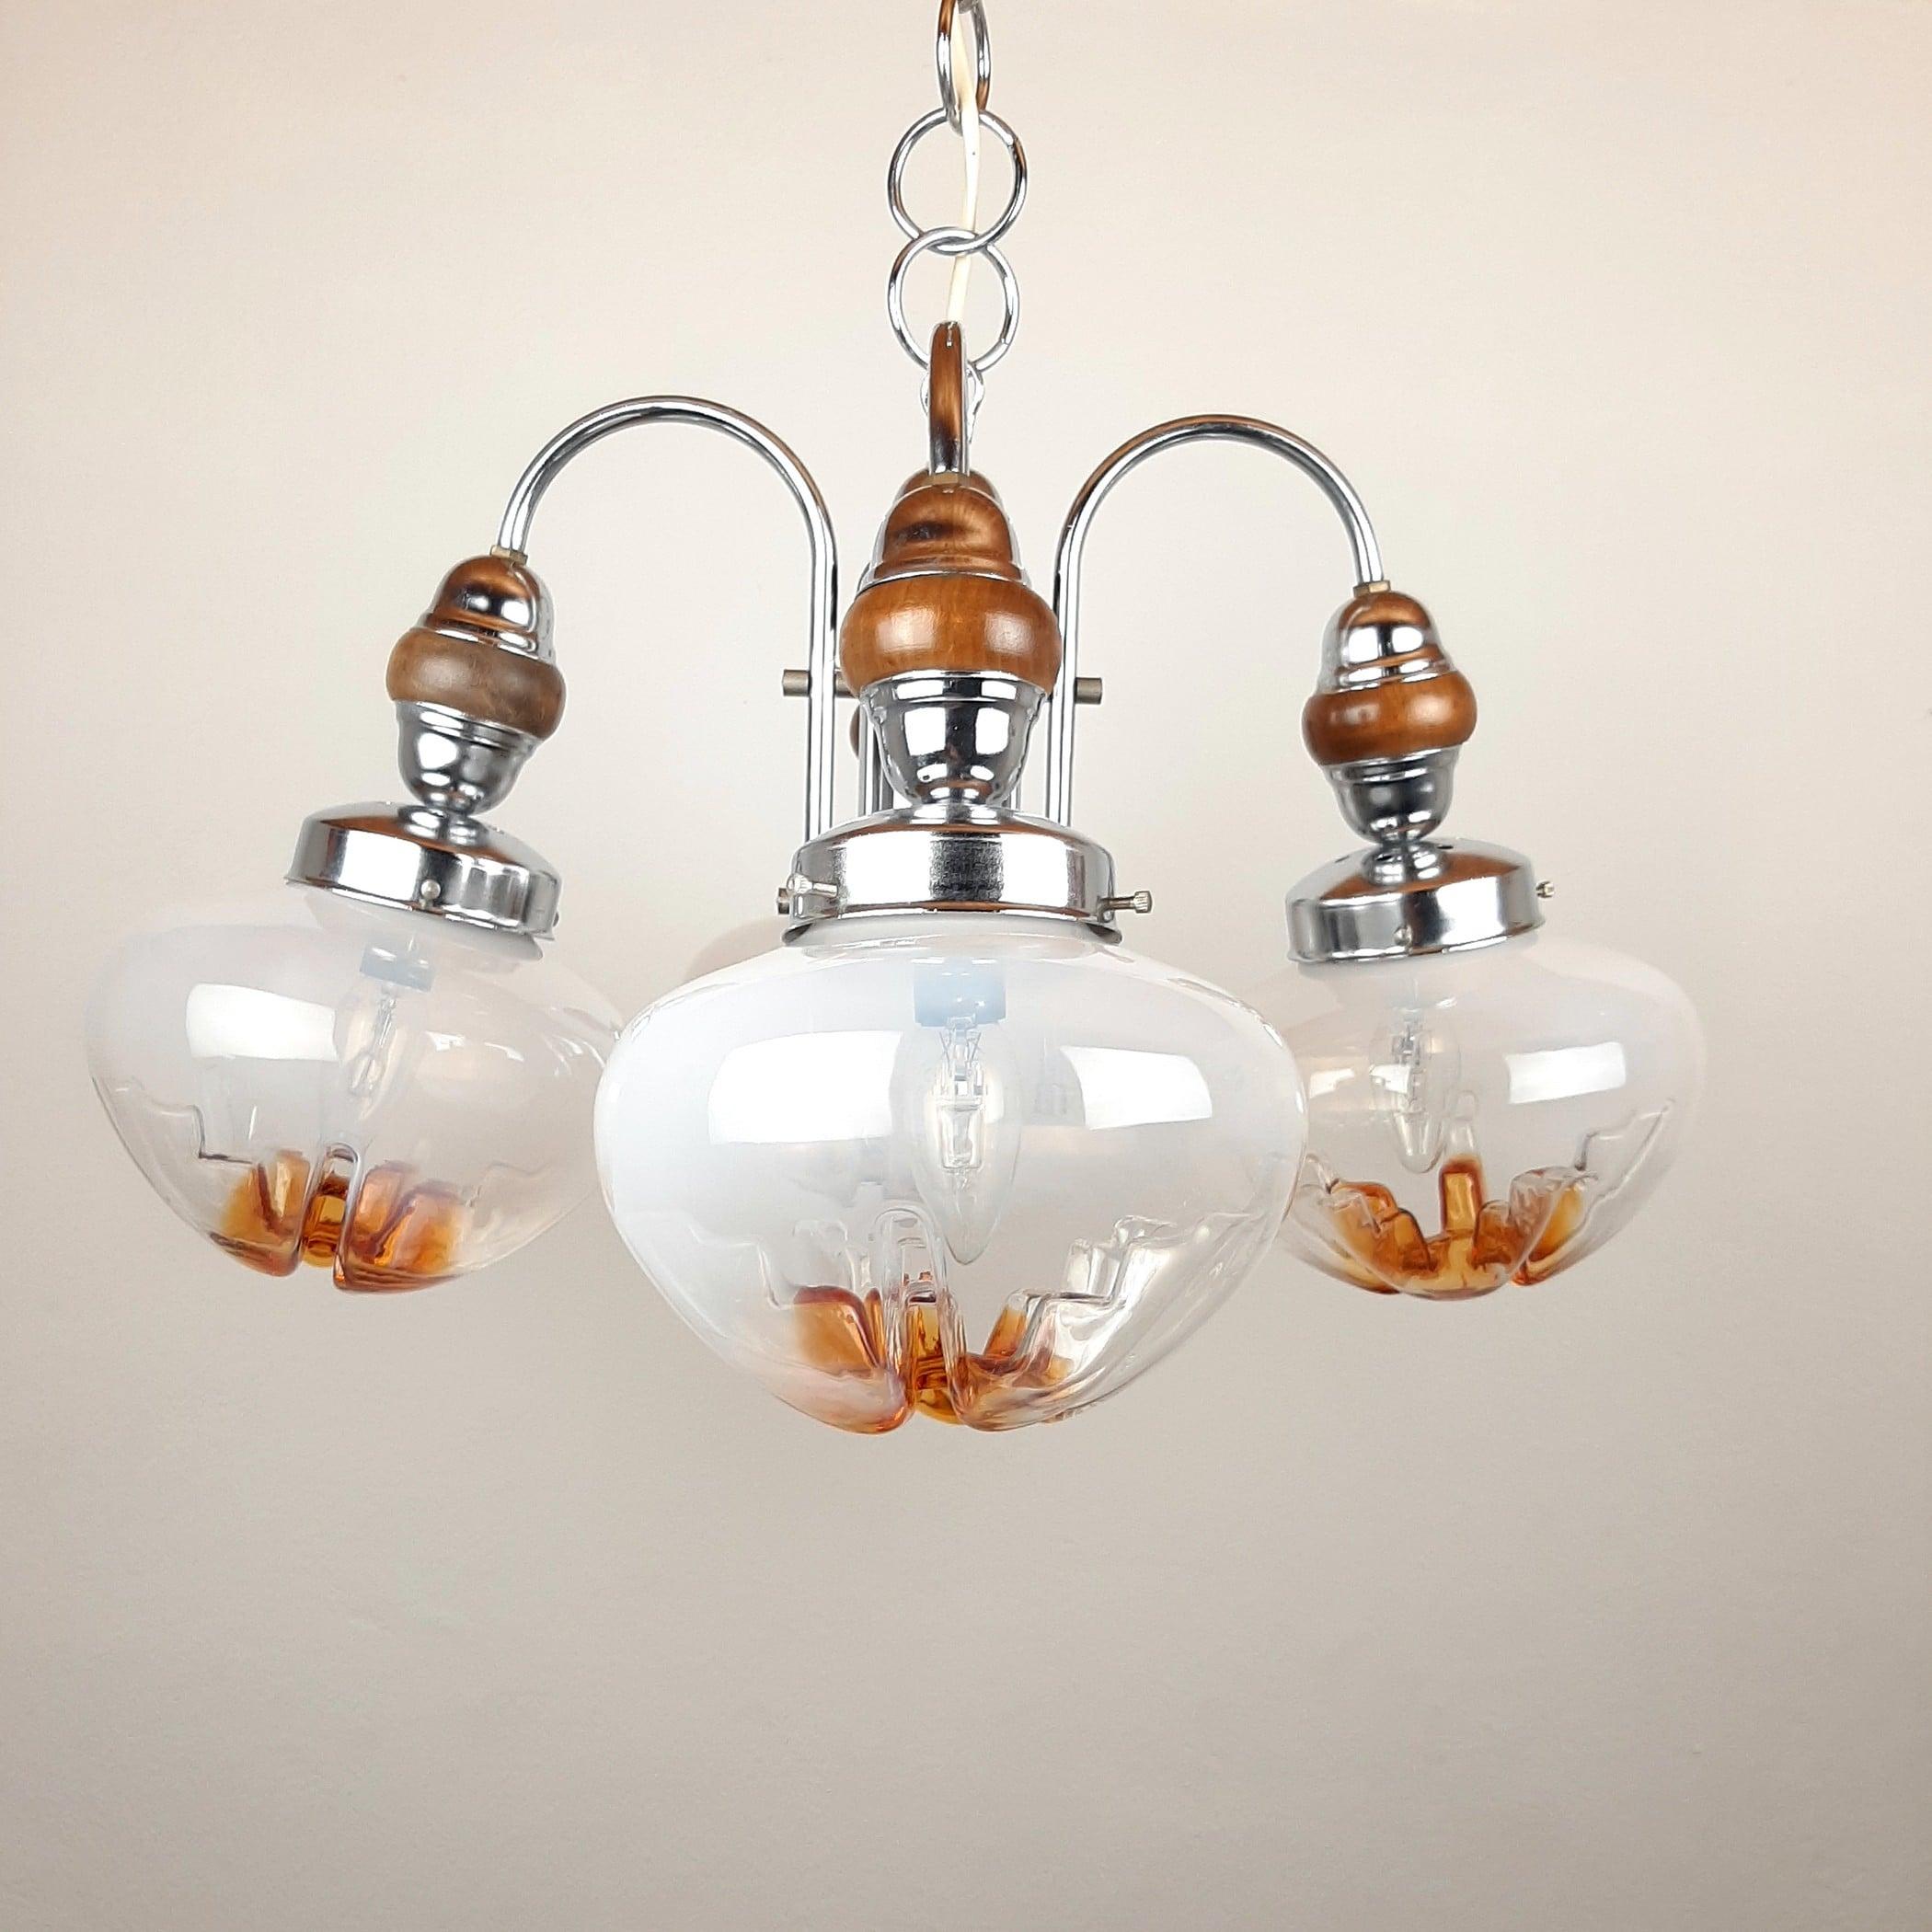 Mid-century 4 arm pendant lamp Yugoslavia 1970s Style Mazzega Metal Glass Space Age white-amber murano art glass bowls